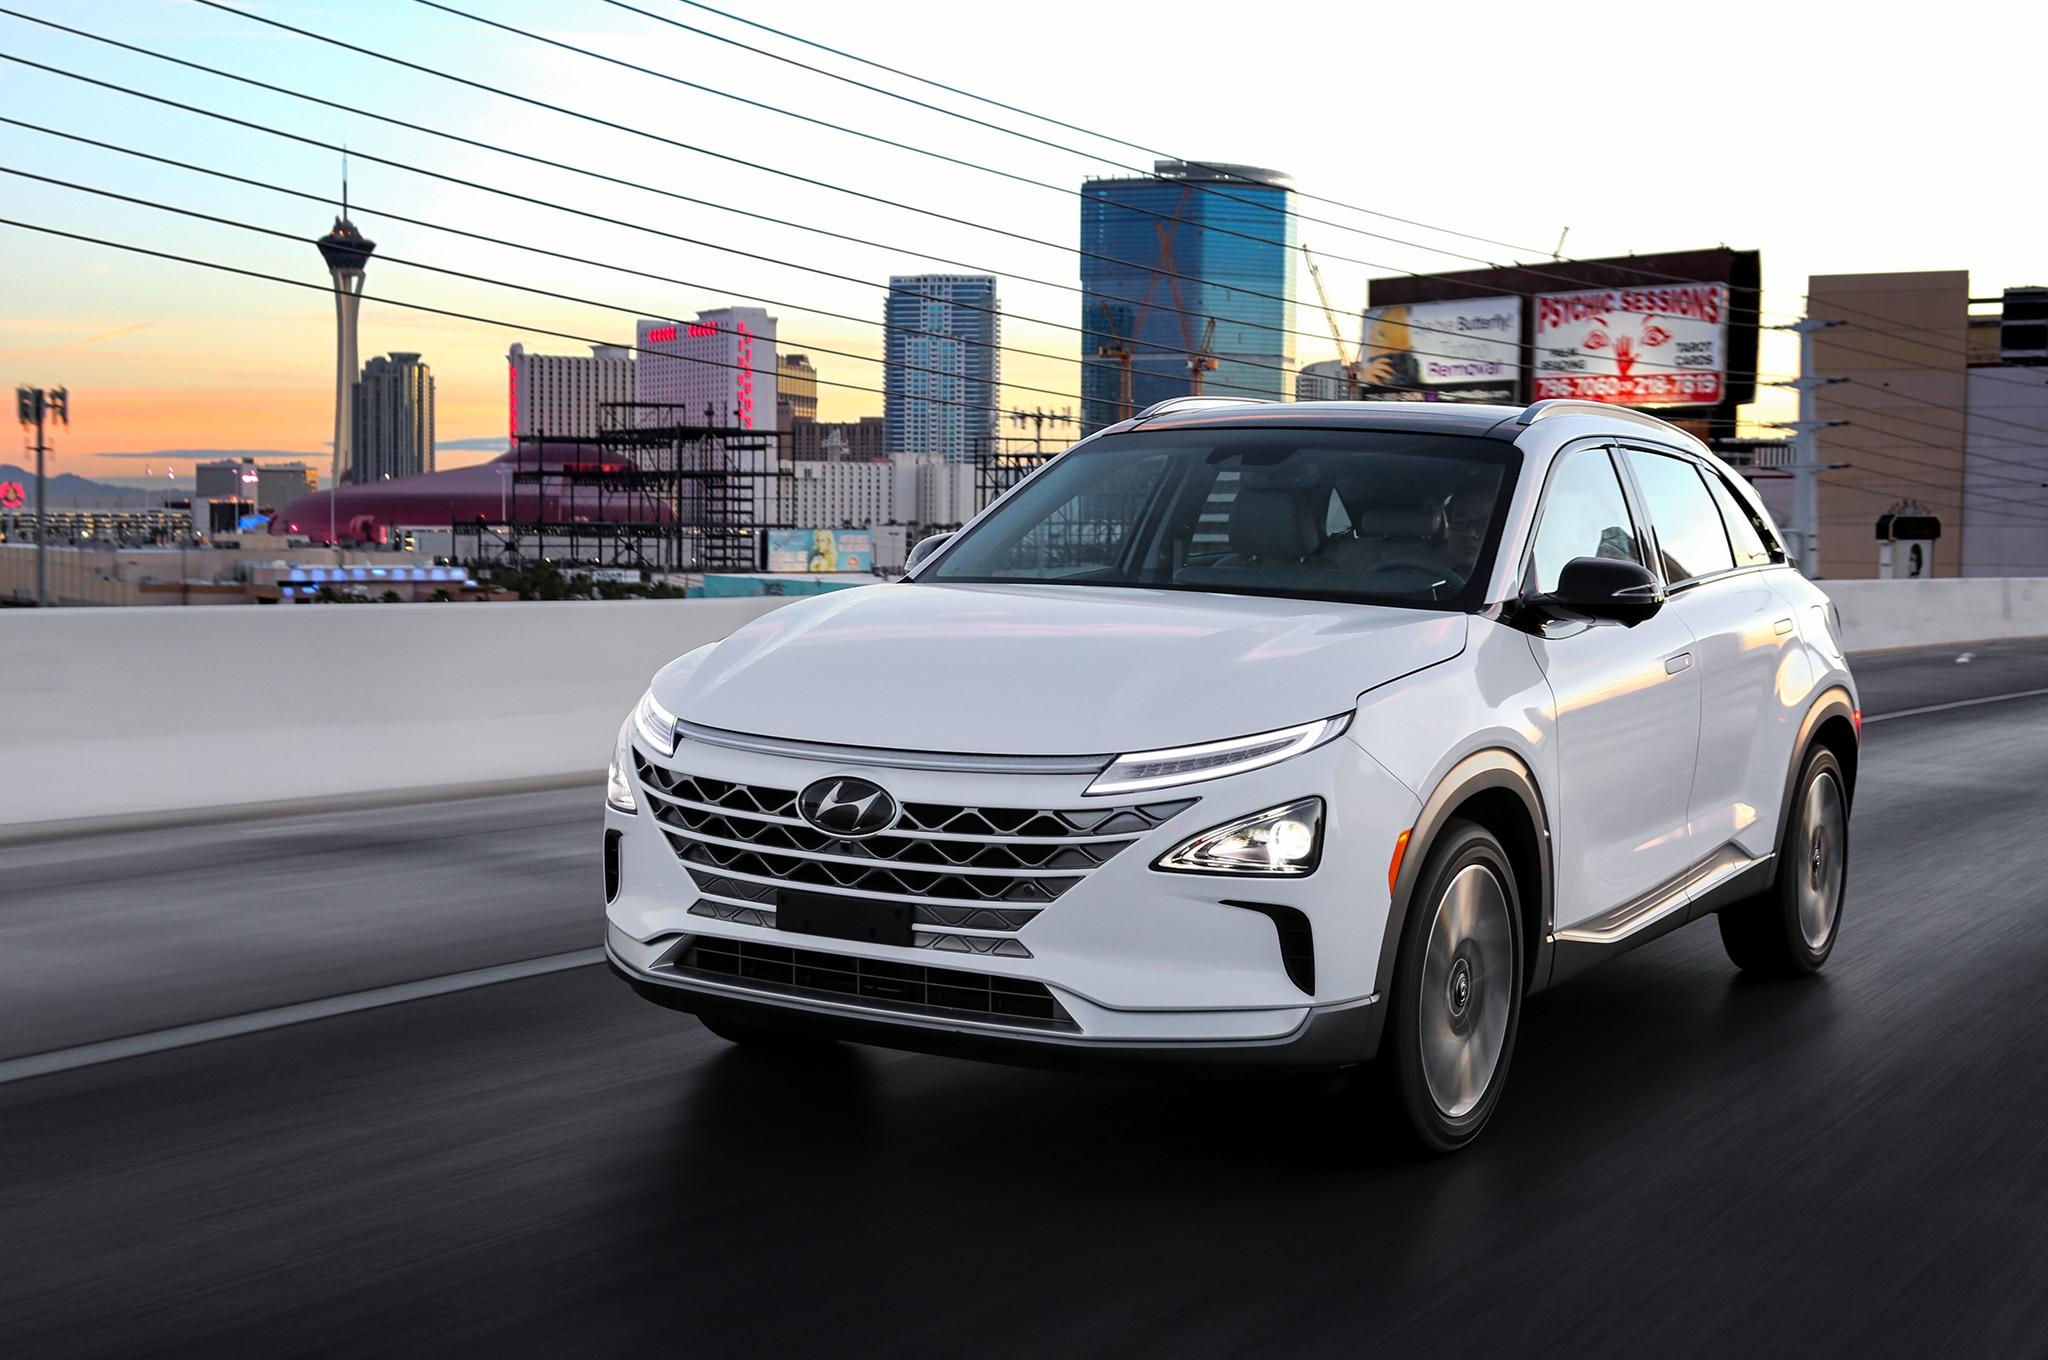 2019 Hyundai Nexo Front Three Quarter In Motion 11